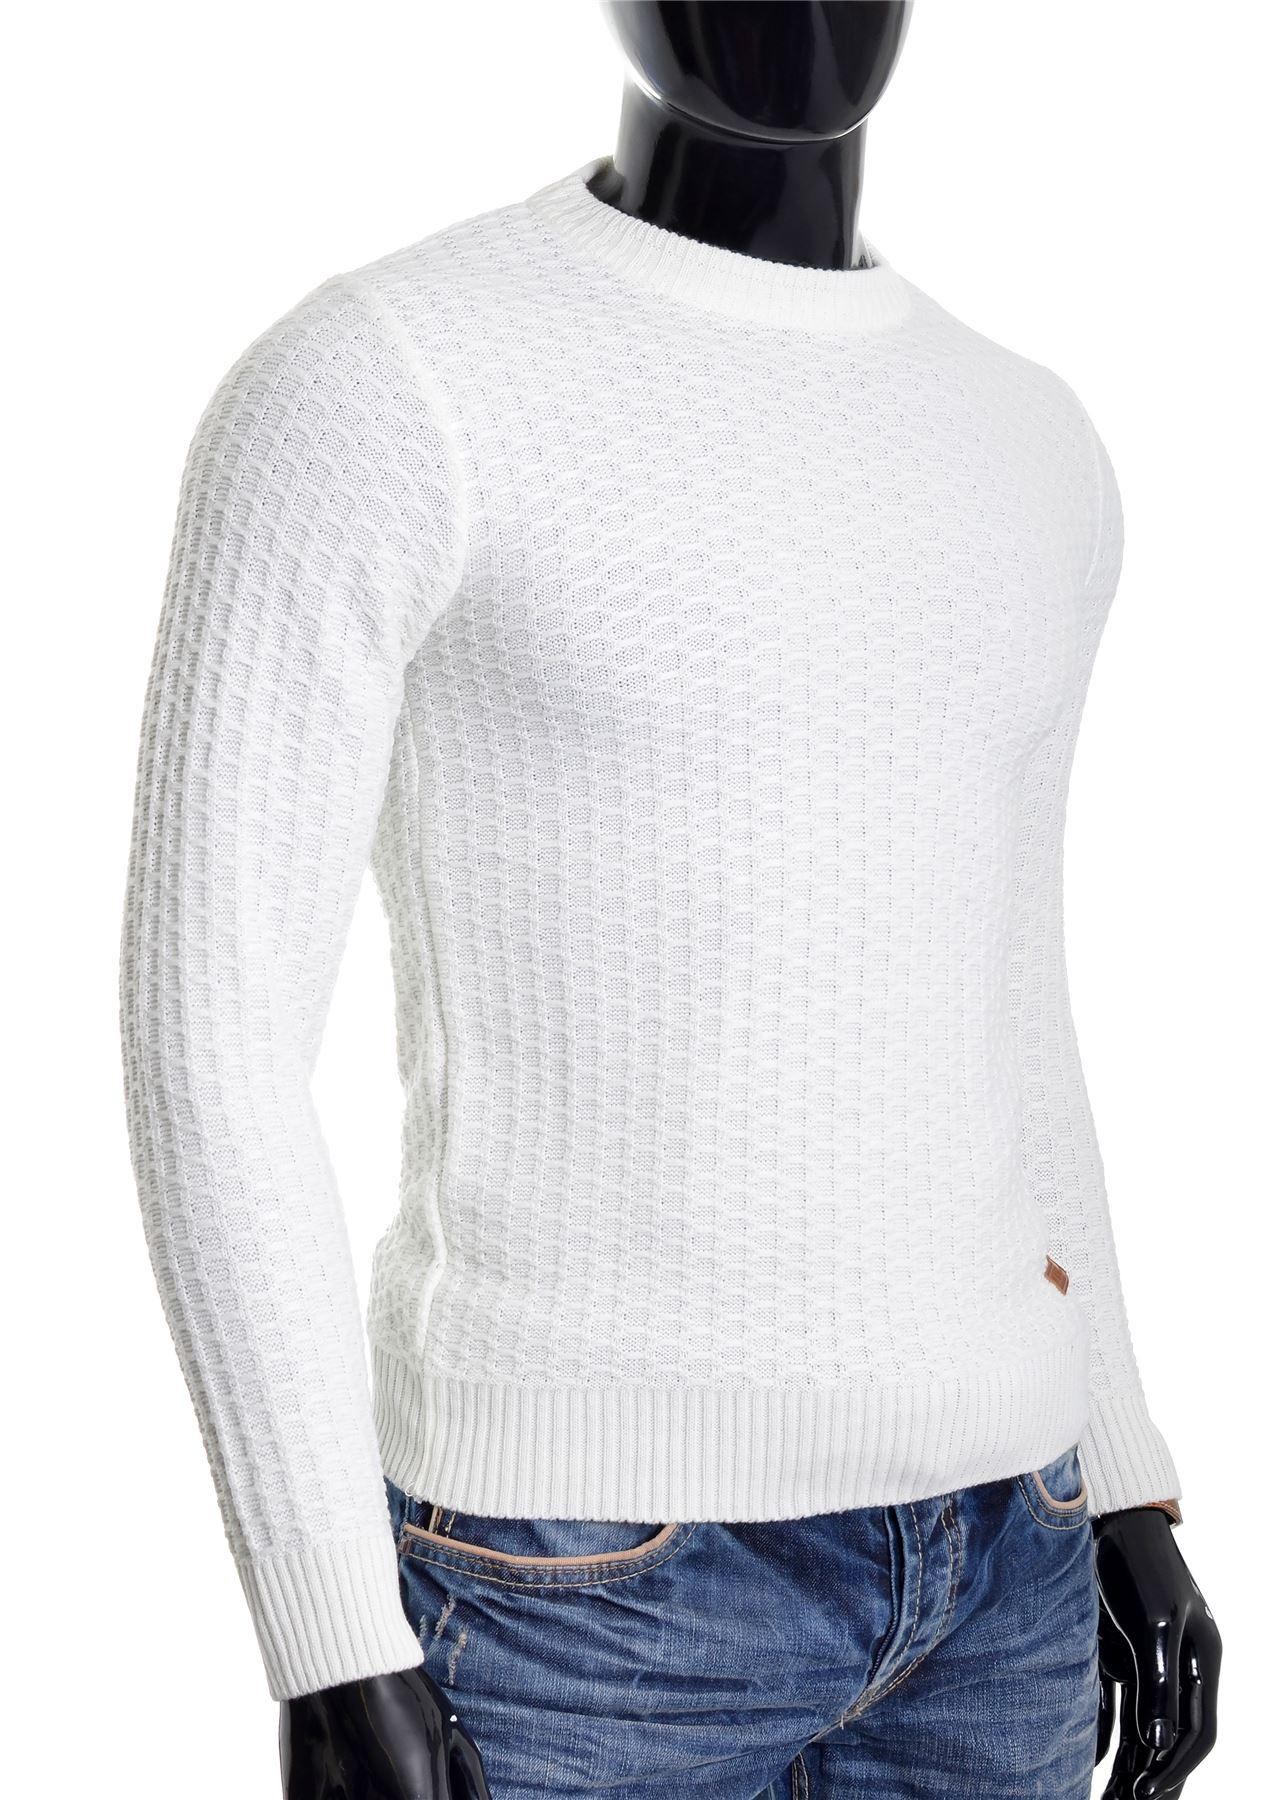 D-amp-R-Men-039-s-Wool-Knit-Jumper-Smart-Long-Sleeve-Sweater-Crew-Neck-Top thumbnail 9